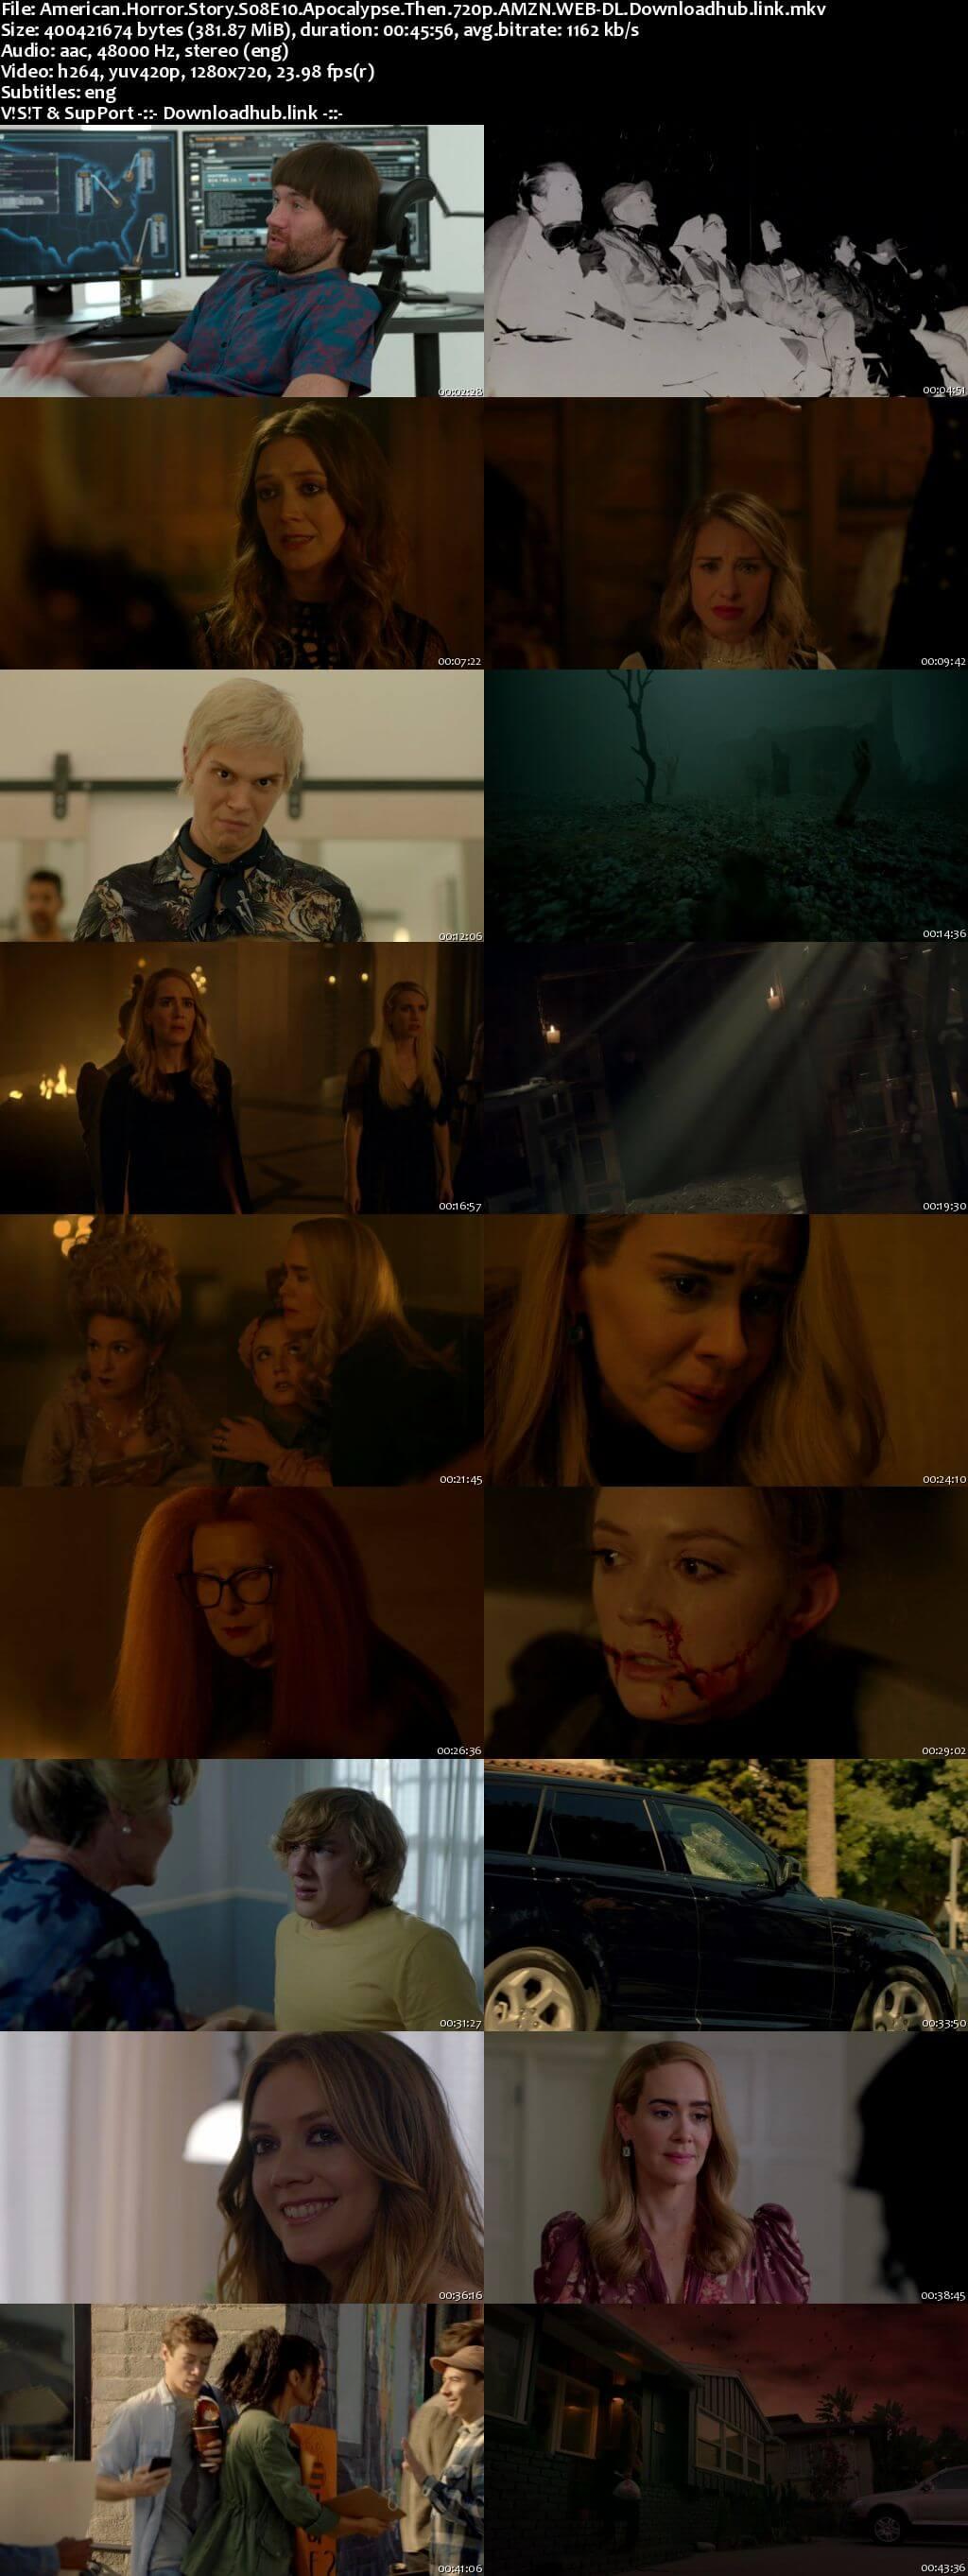 American Horror Story S08E10 350MB AMZN WEB-DL 720p ESubs